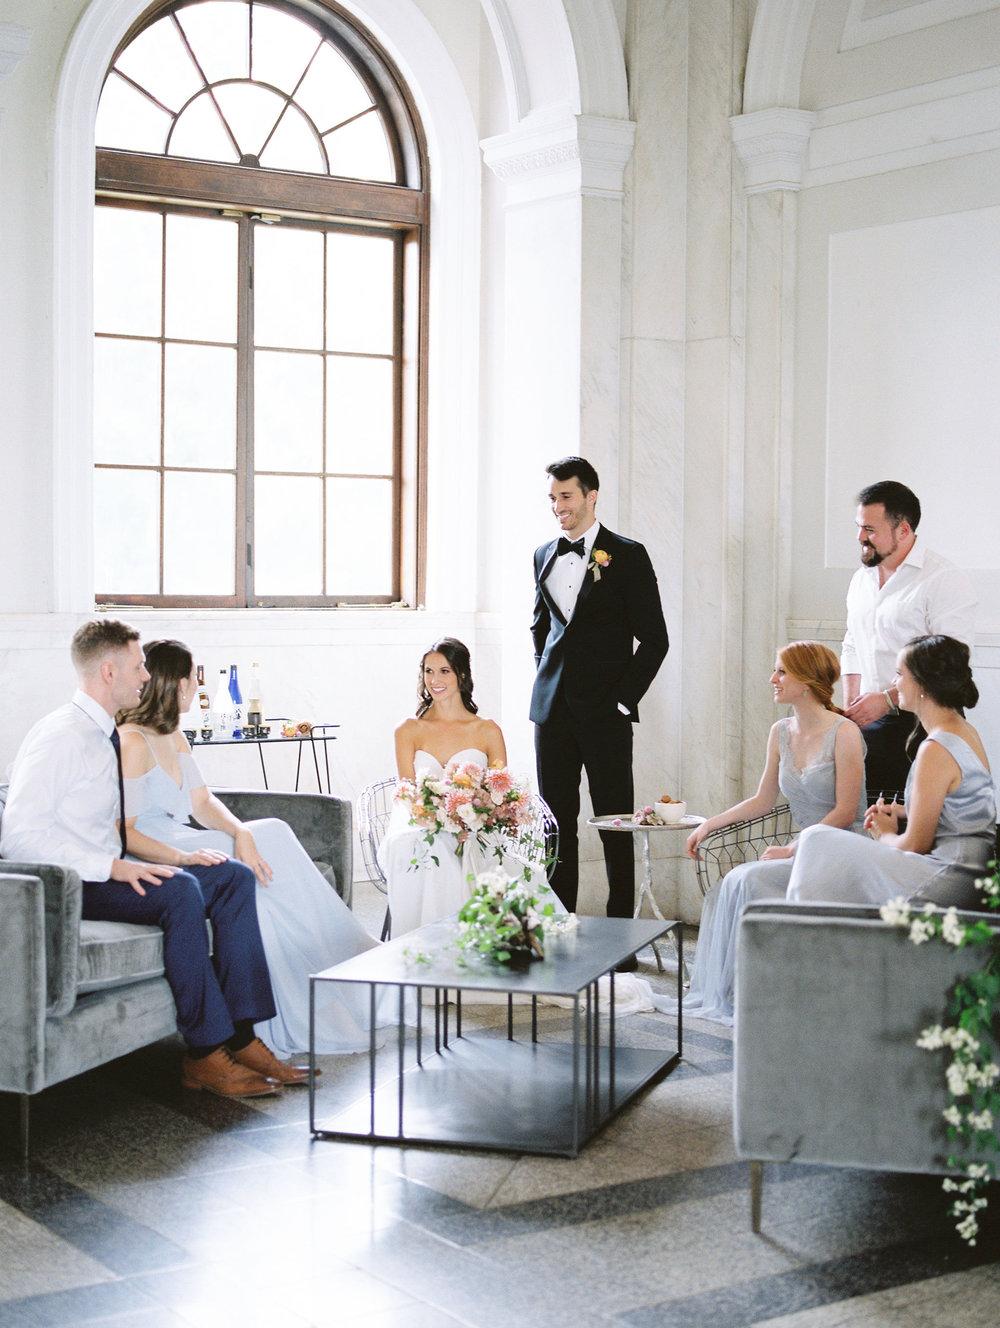 www.hannahforsberg.com-delkab-court-house-wedding-decatur-atlanta-wedding-photographer-137.jpg